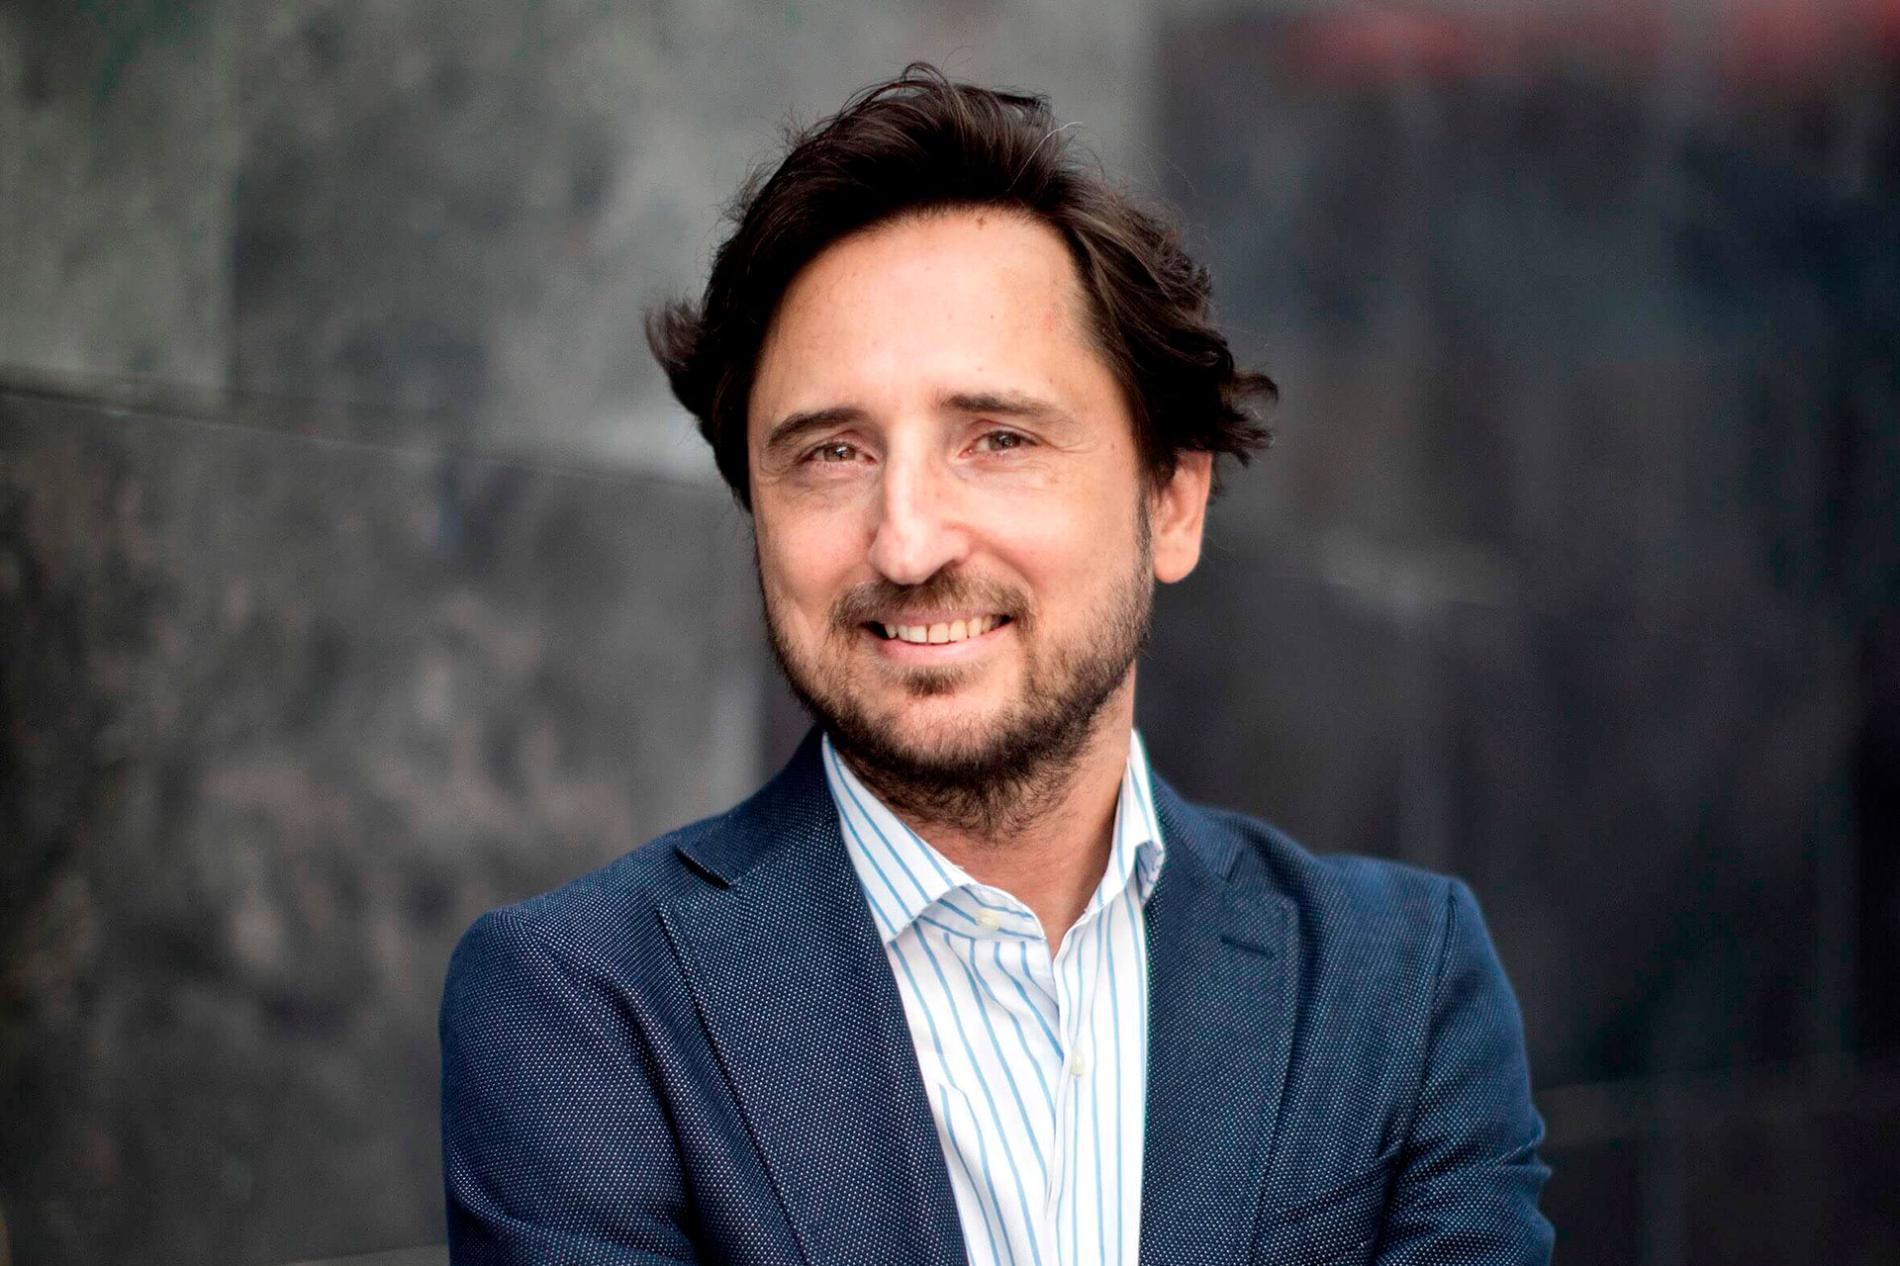 Entrevista Estrategia Digital Jose Javier Blanquer